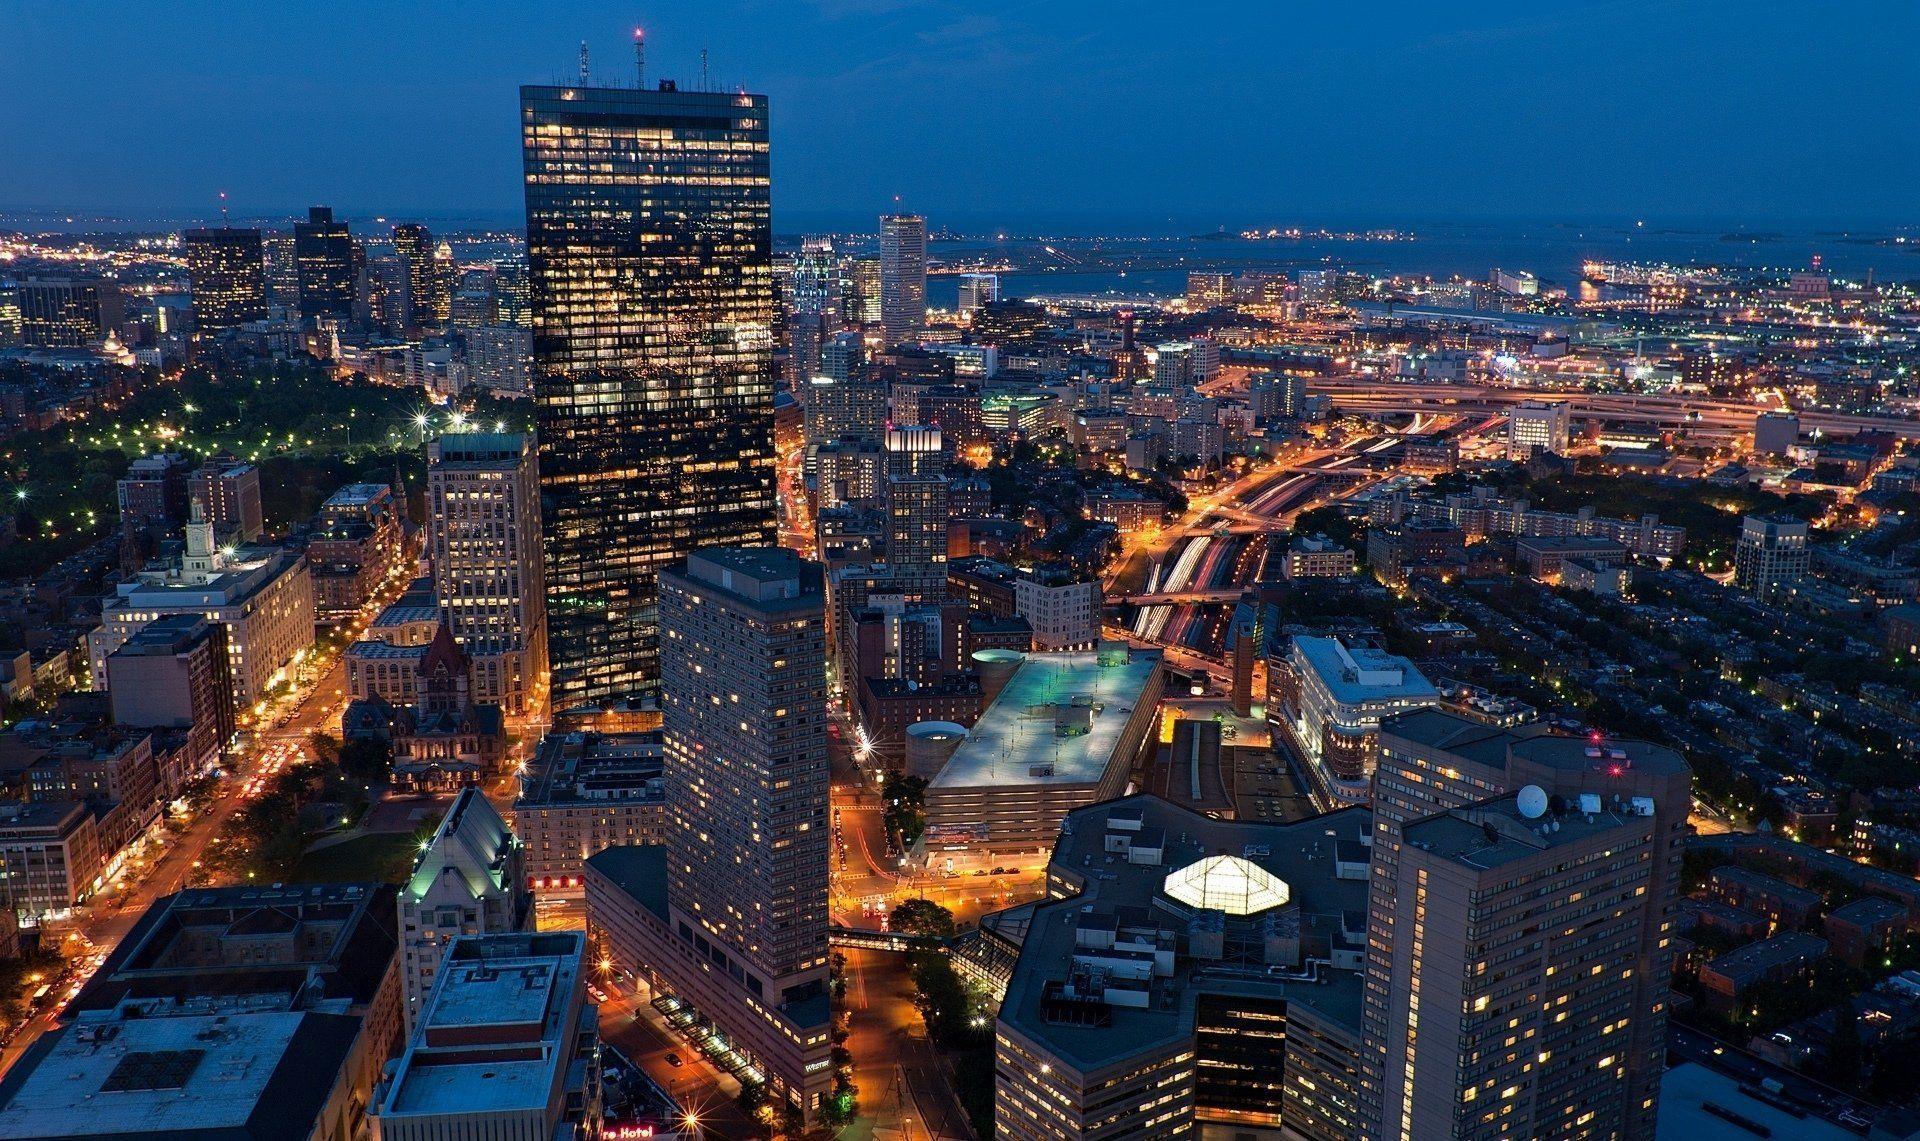 Massachusetts Wallpapers - Top Free